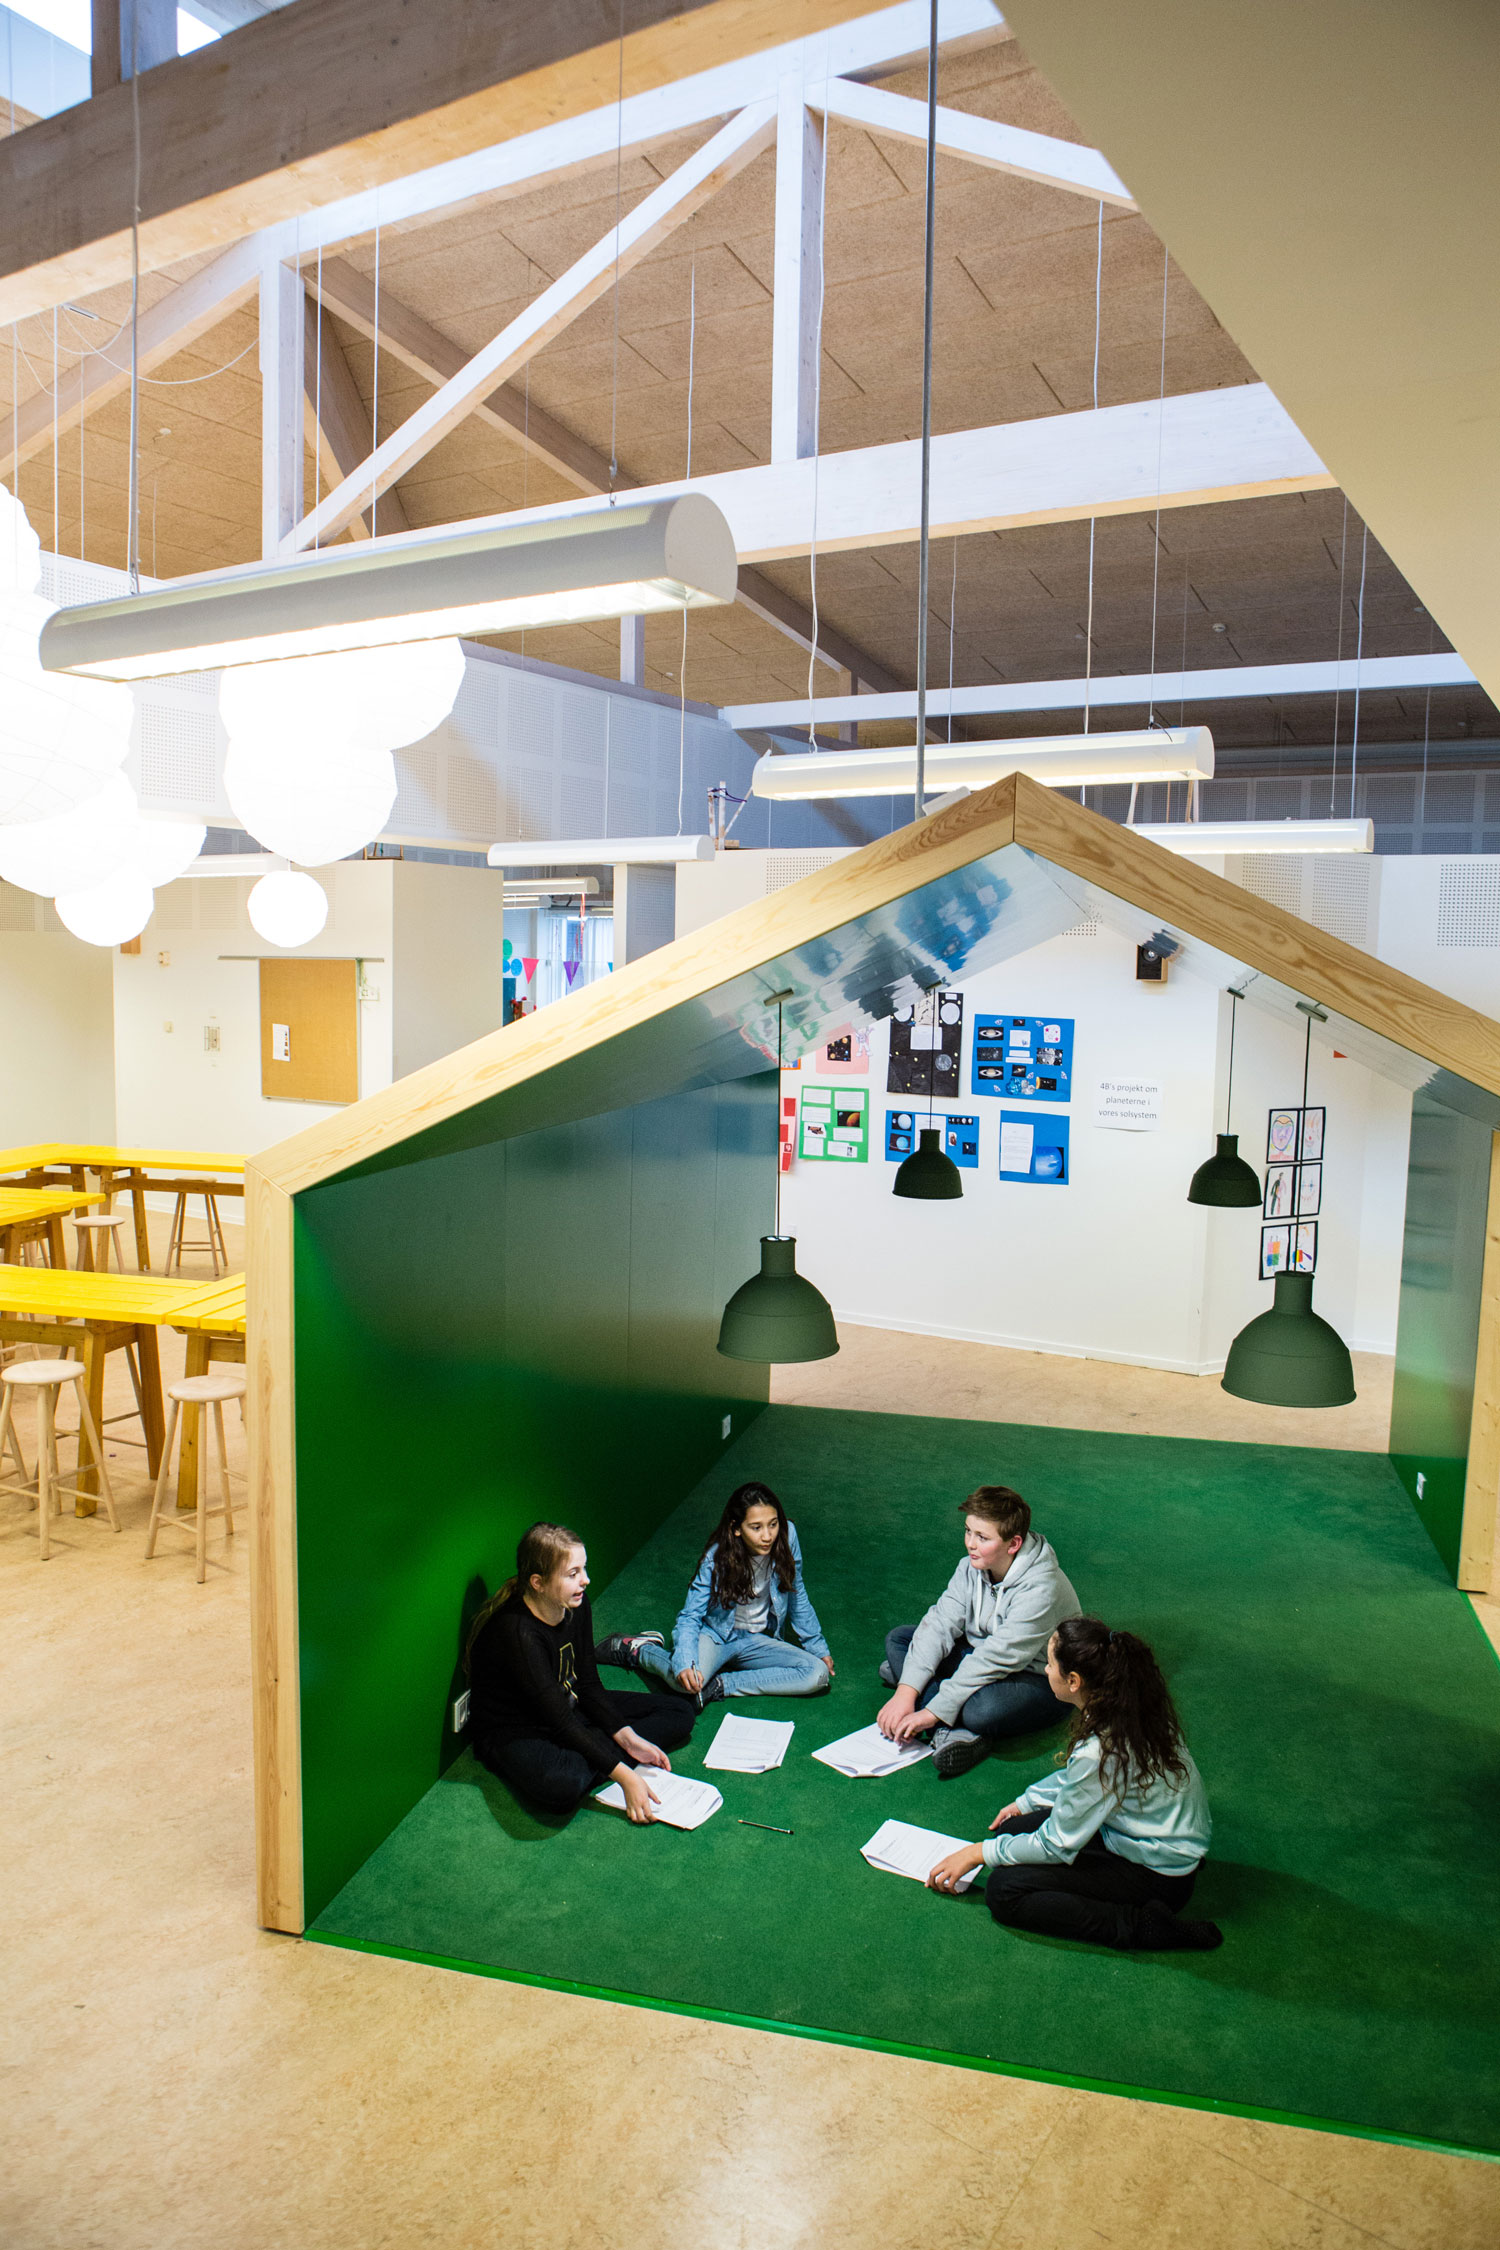 engstrandskolen grønt område Rune Fjord Studio